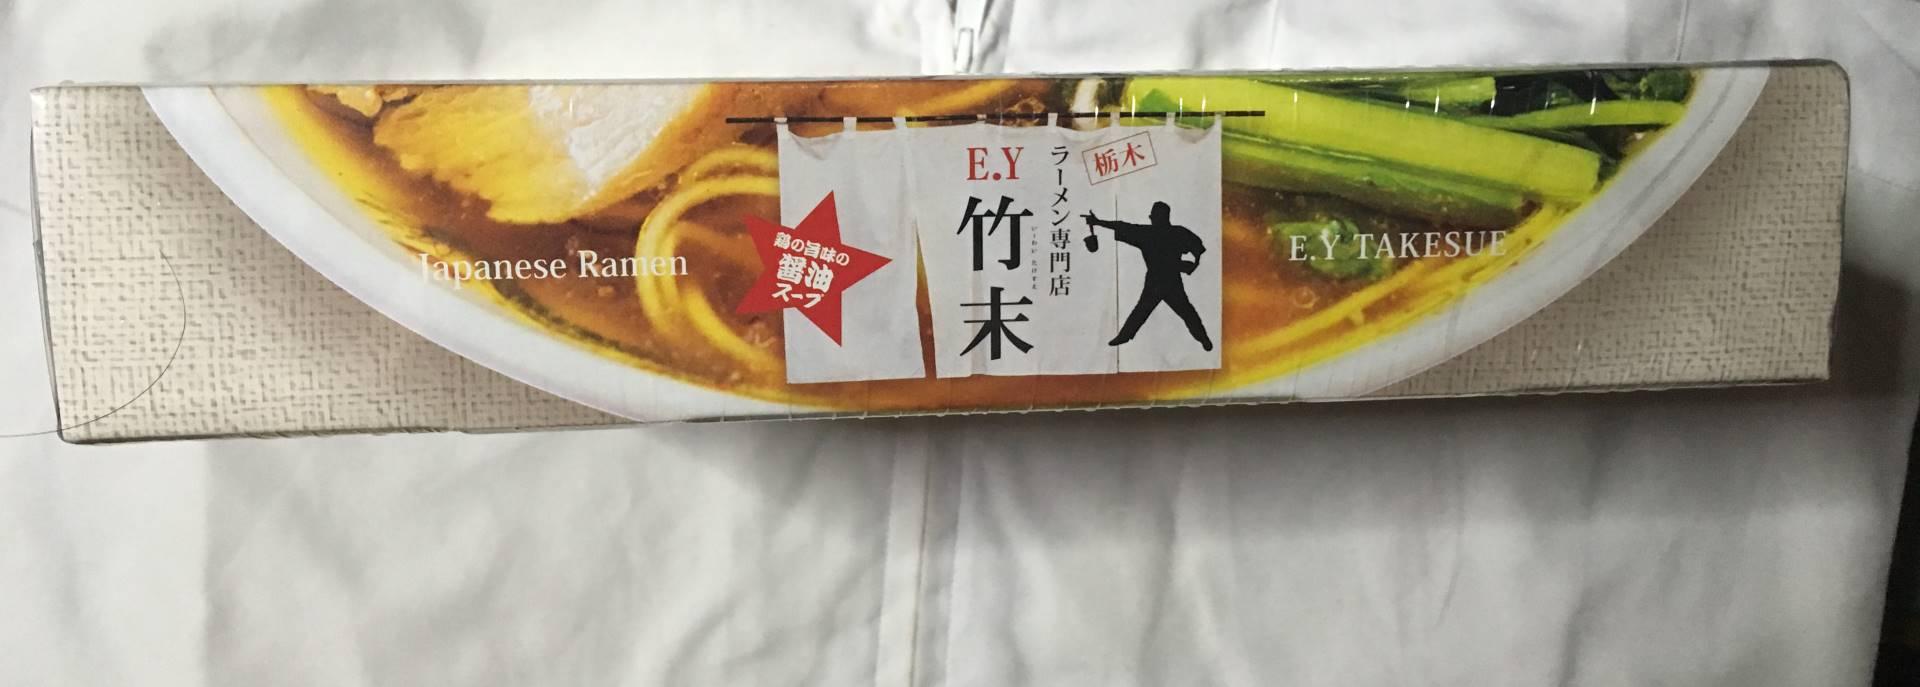 EY竹末 (竹末本店)の半生麺の側面デザイン